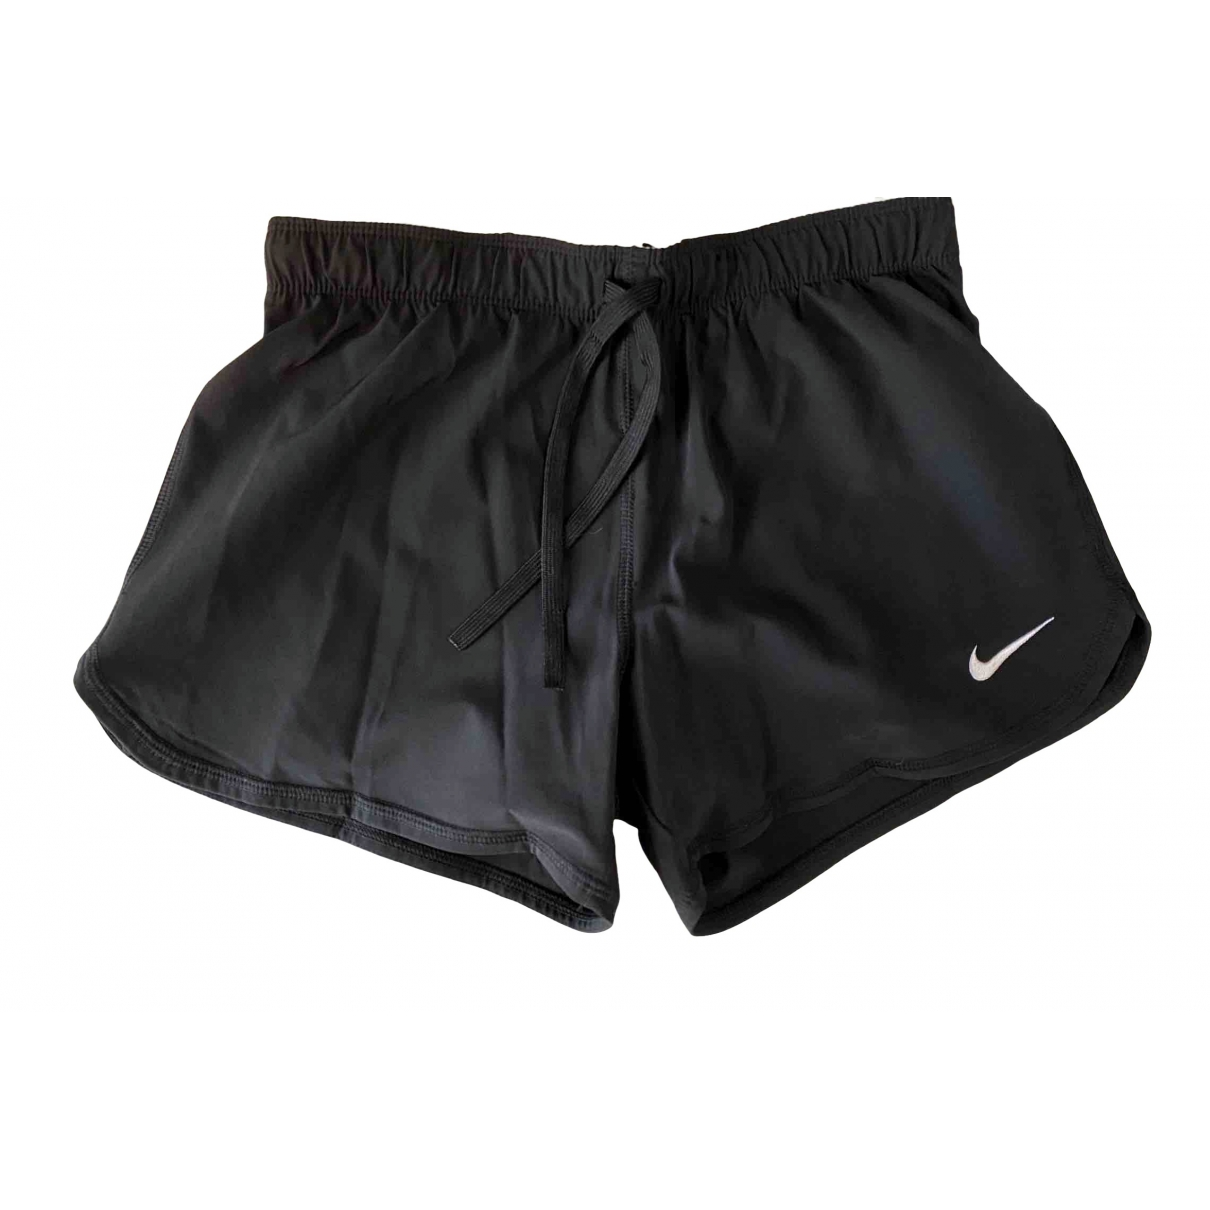 Nike \N Black Shorts for Women XS International